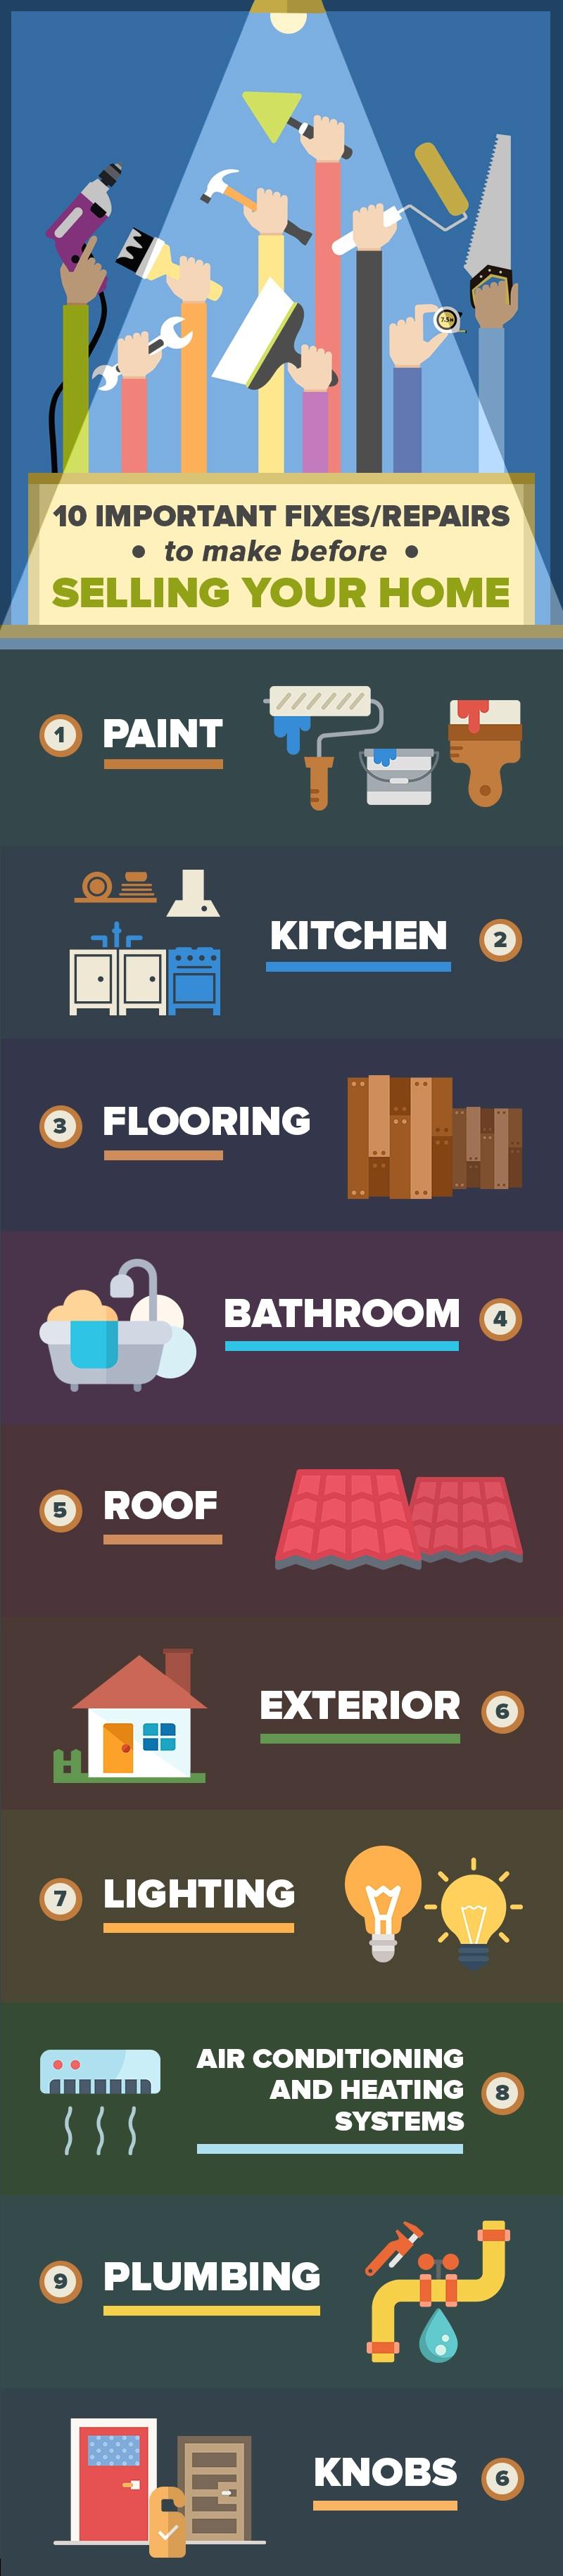 10 fixes.jpg